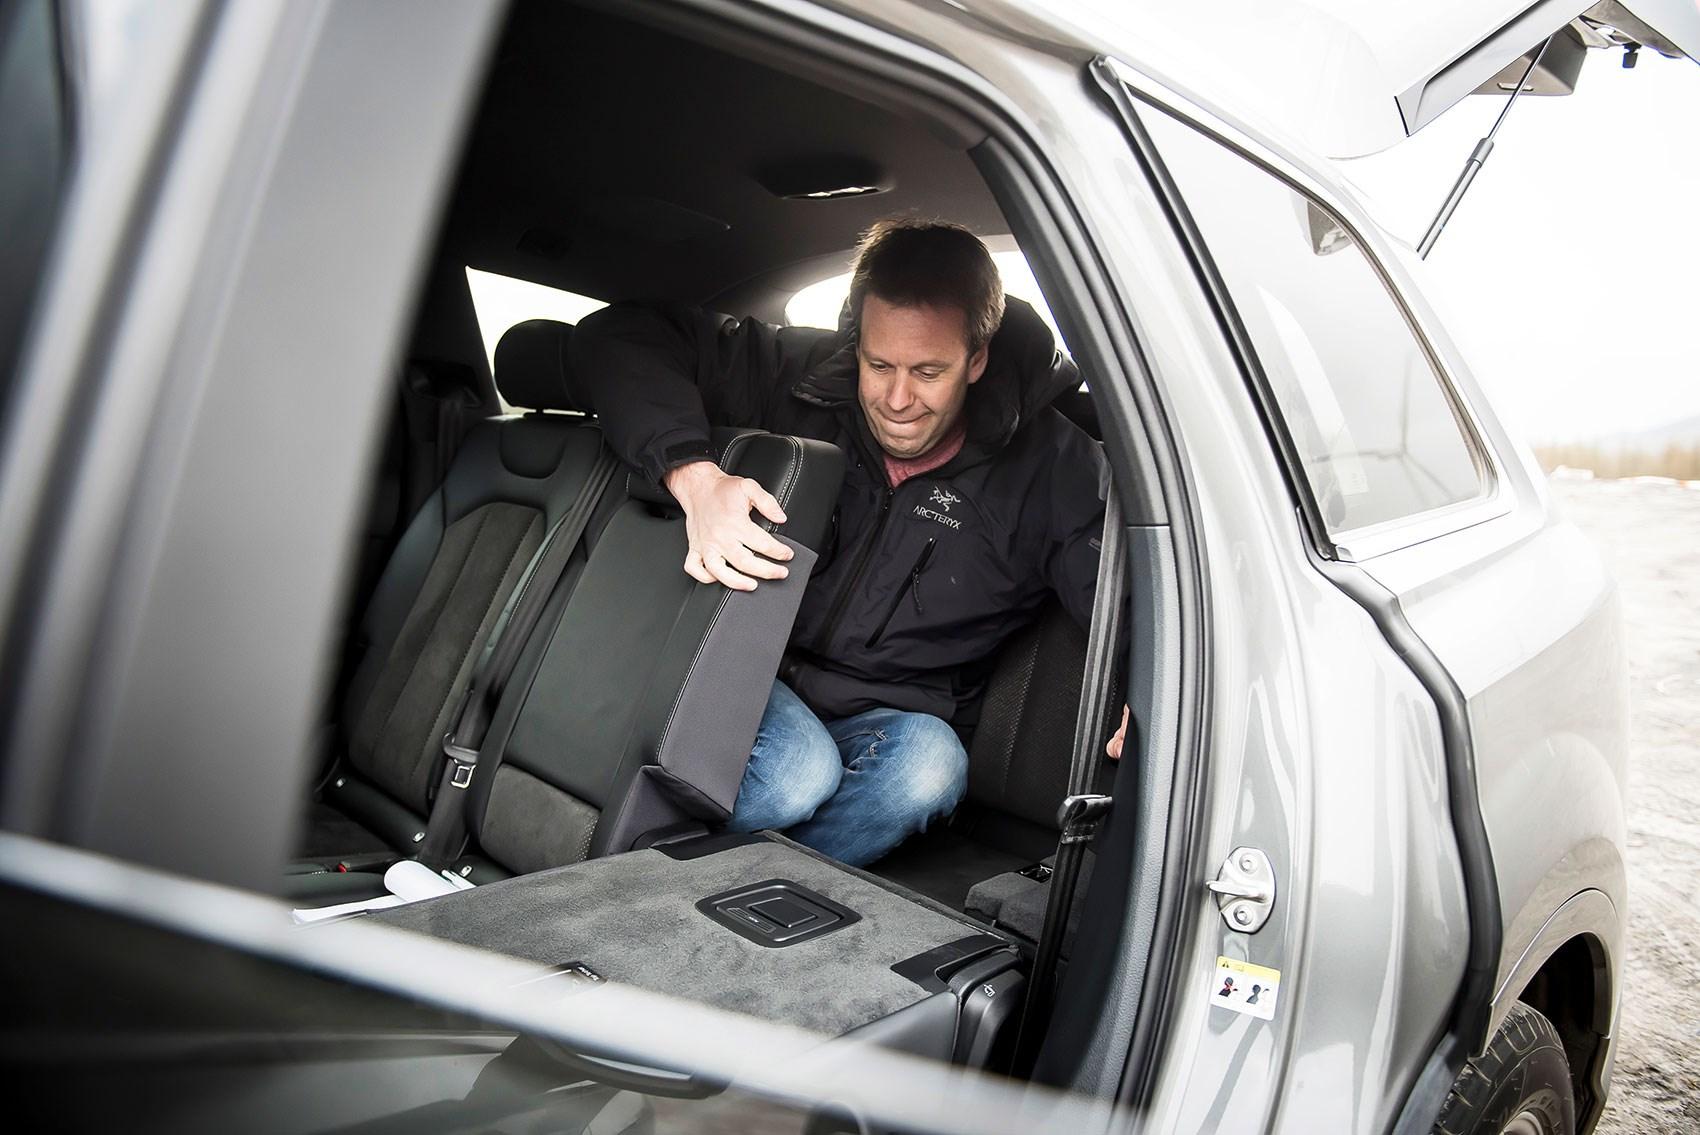 Volvo Xc90 Vs Audi Q7 >> Land Rover Discovery vs Audi Q7 vs BMW X5 vs Volvo XC90 ...